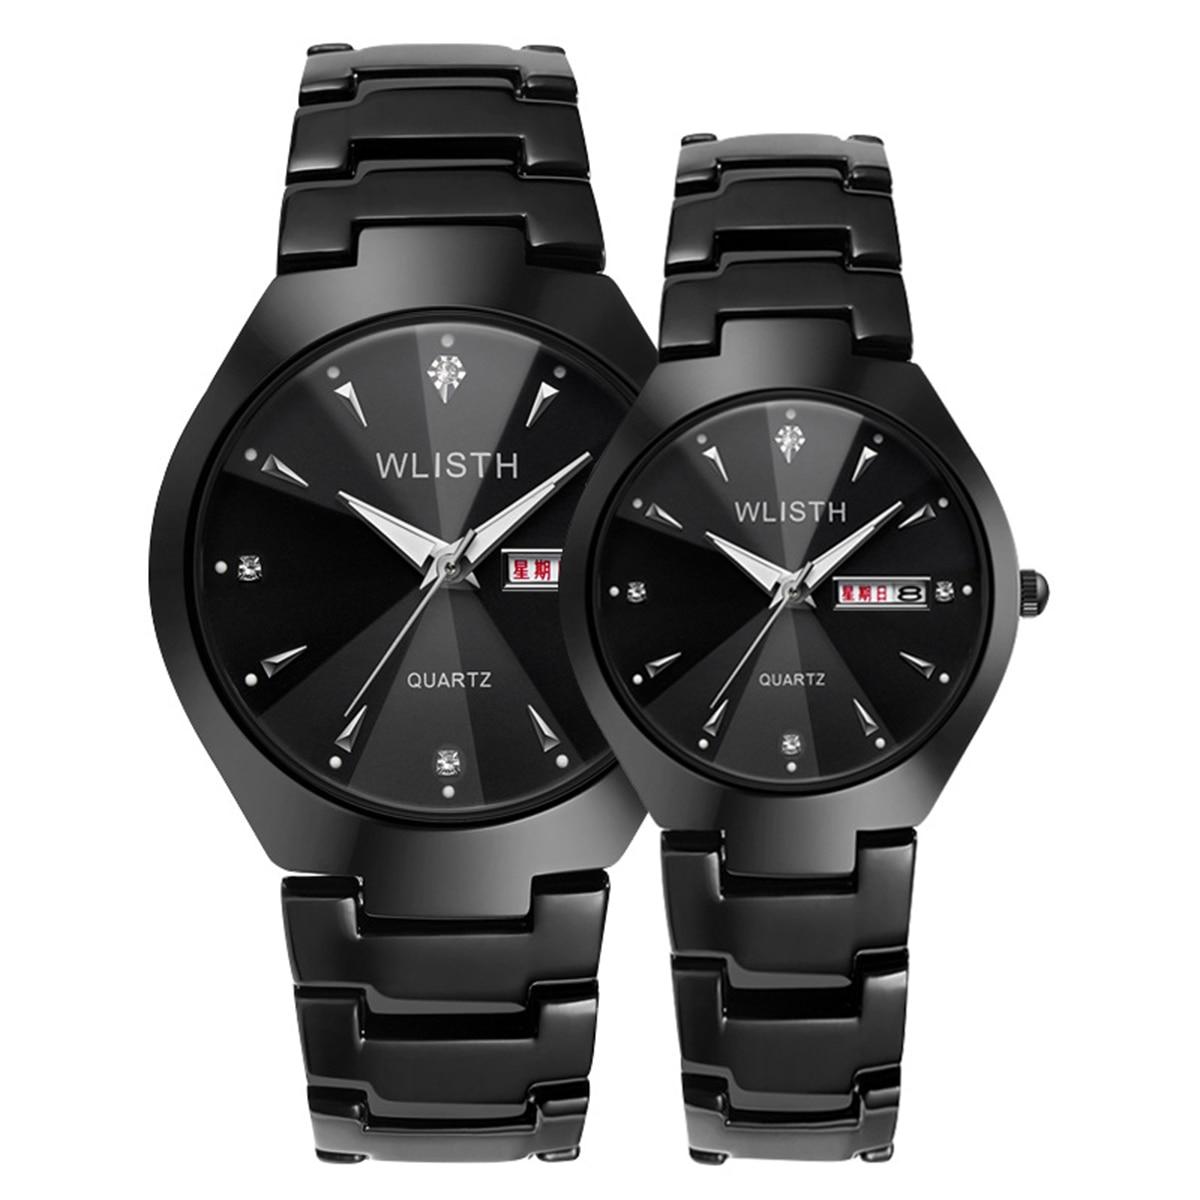 Couple Watch luxury Fashion Men Women Quartz Watch Dial Clock Luminous Wrist Watch Waterproof Luxury Wristwatch 2 Sizes